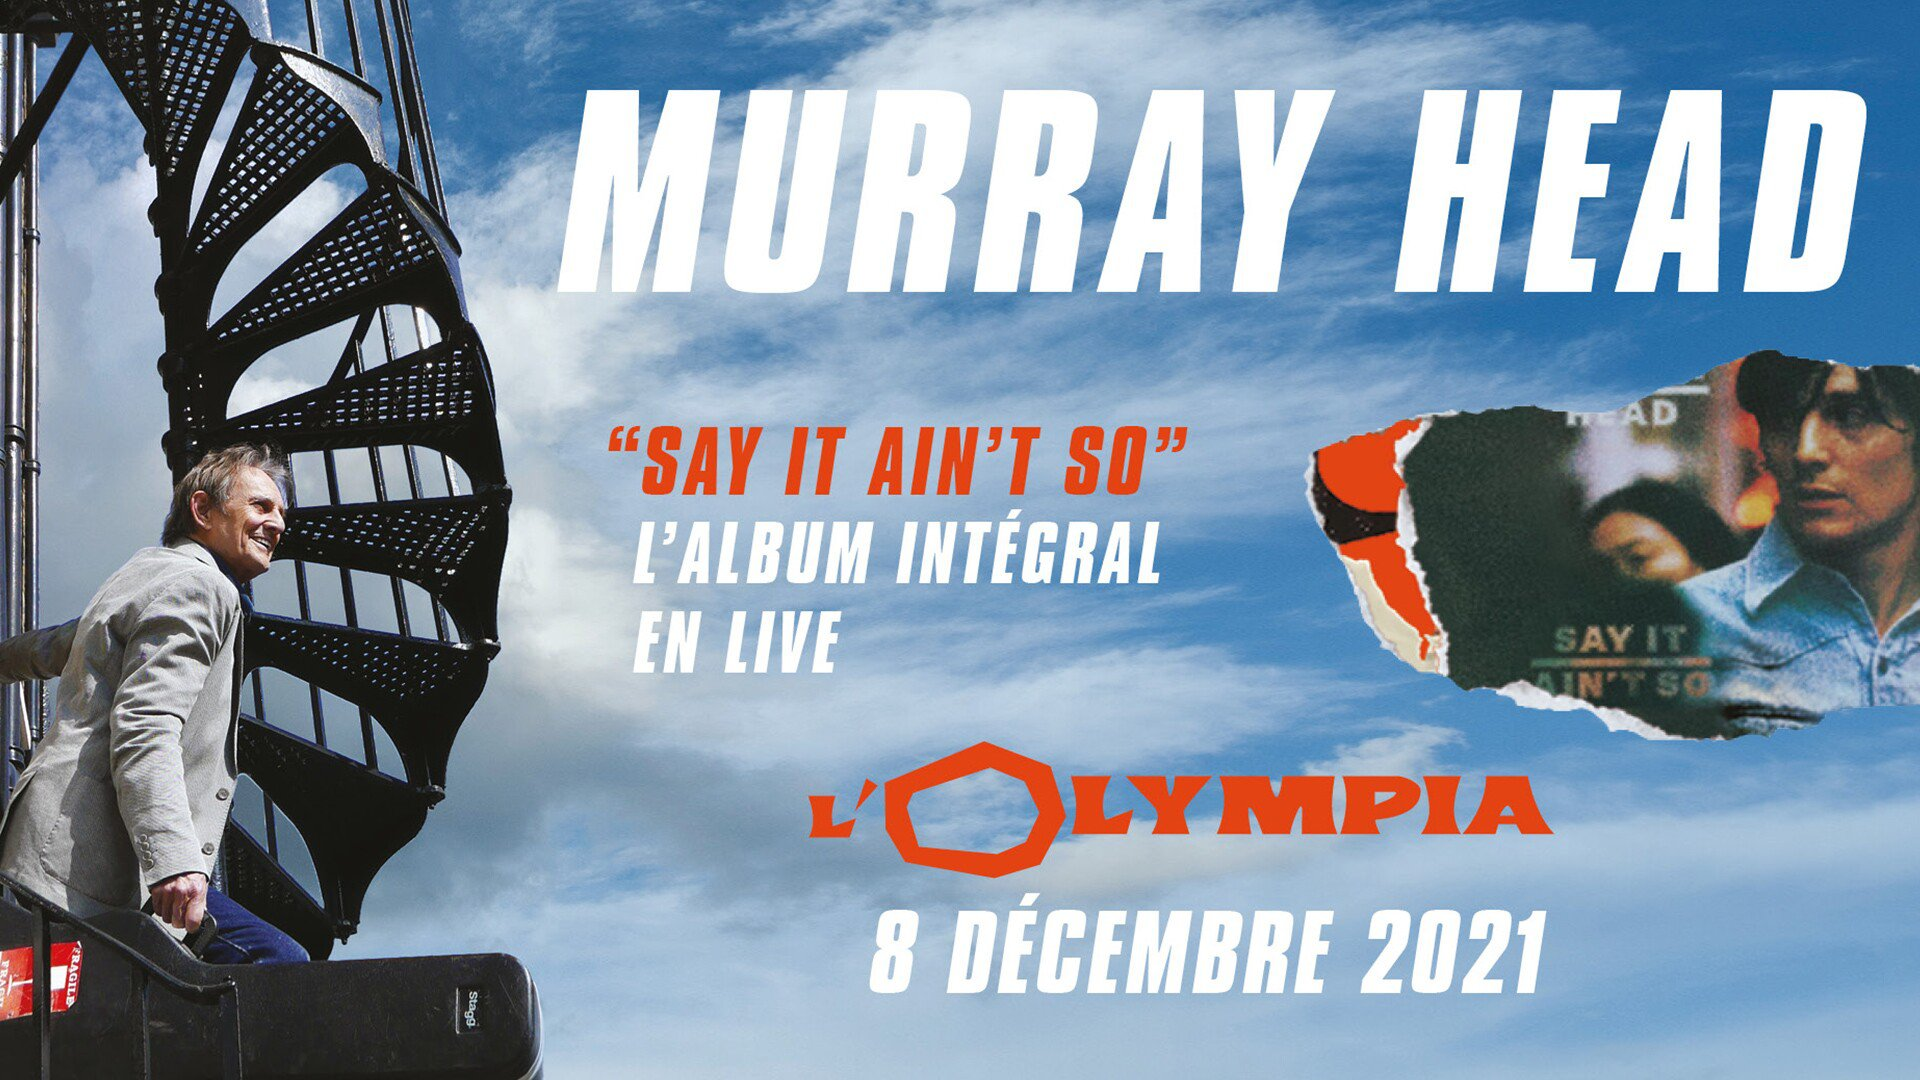 Murray Head tournée 2021